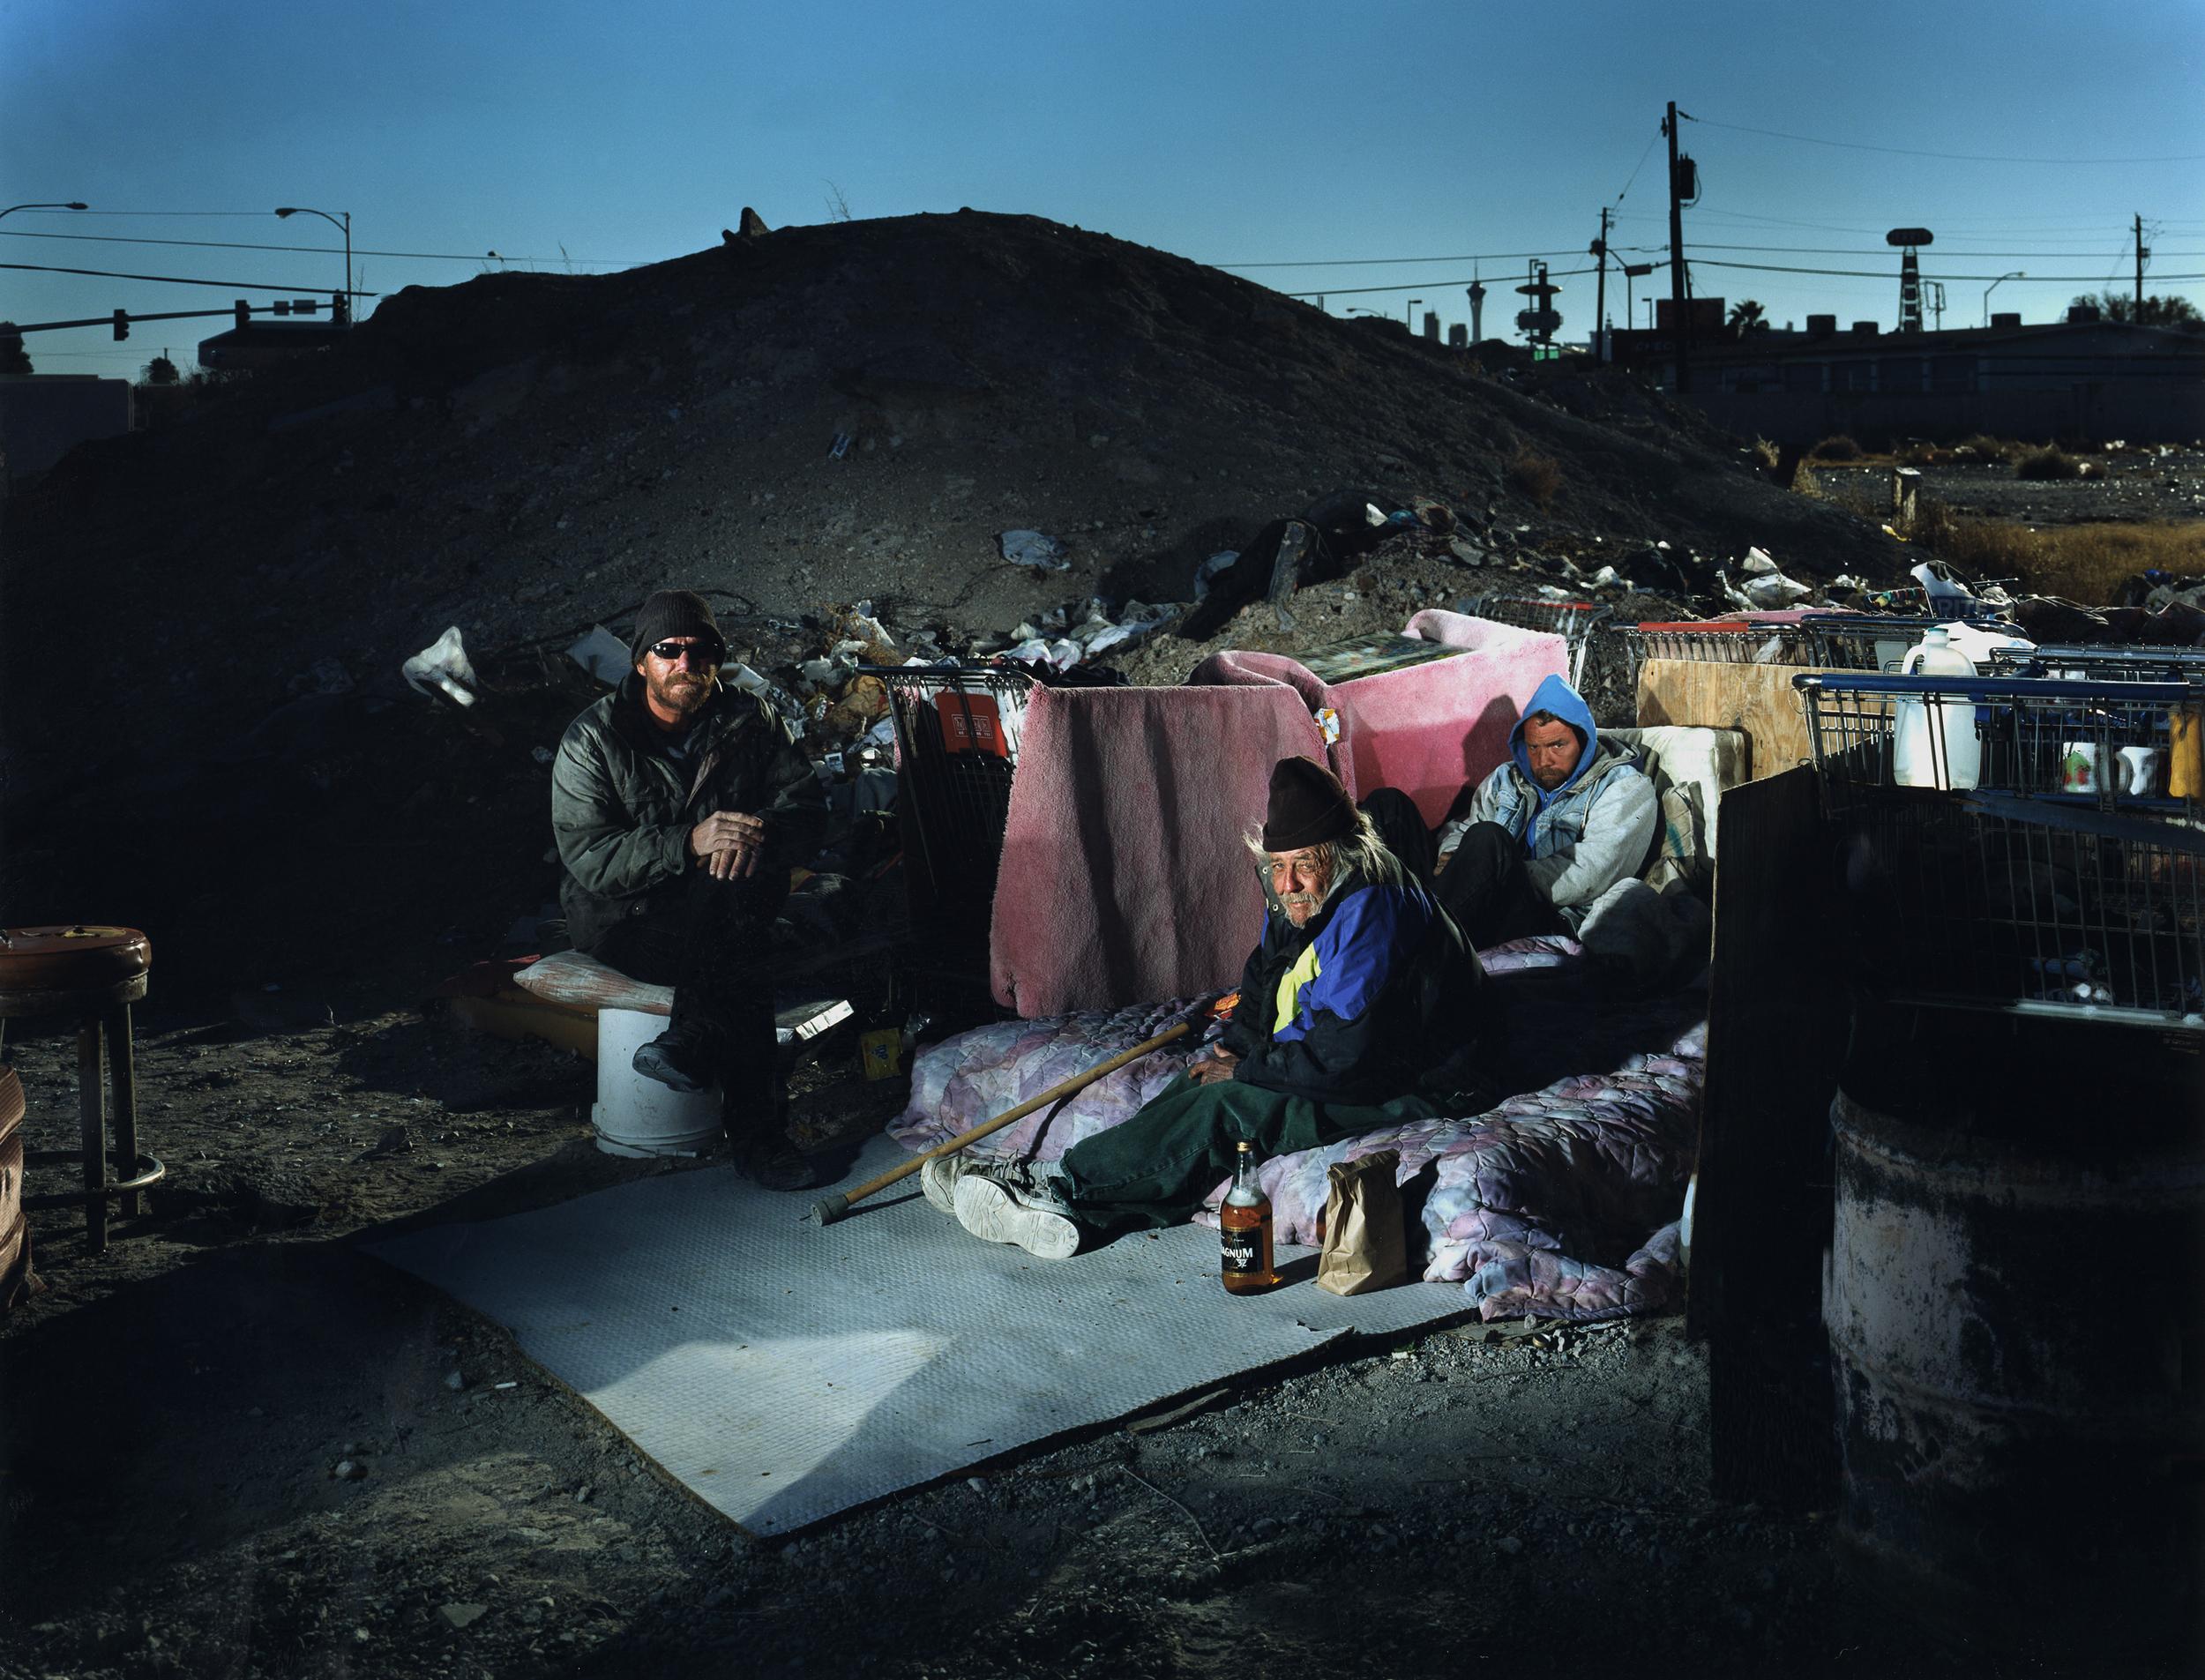 Homeless camp - Las Vegas, NV